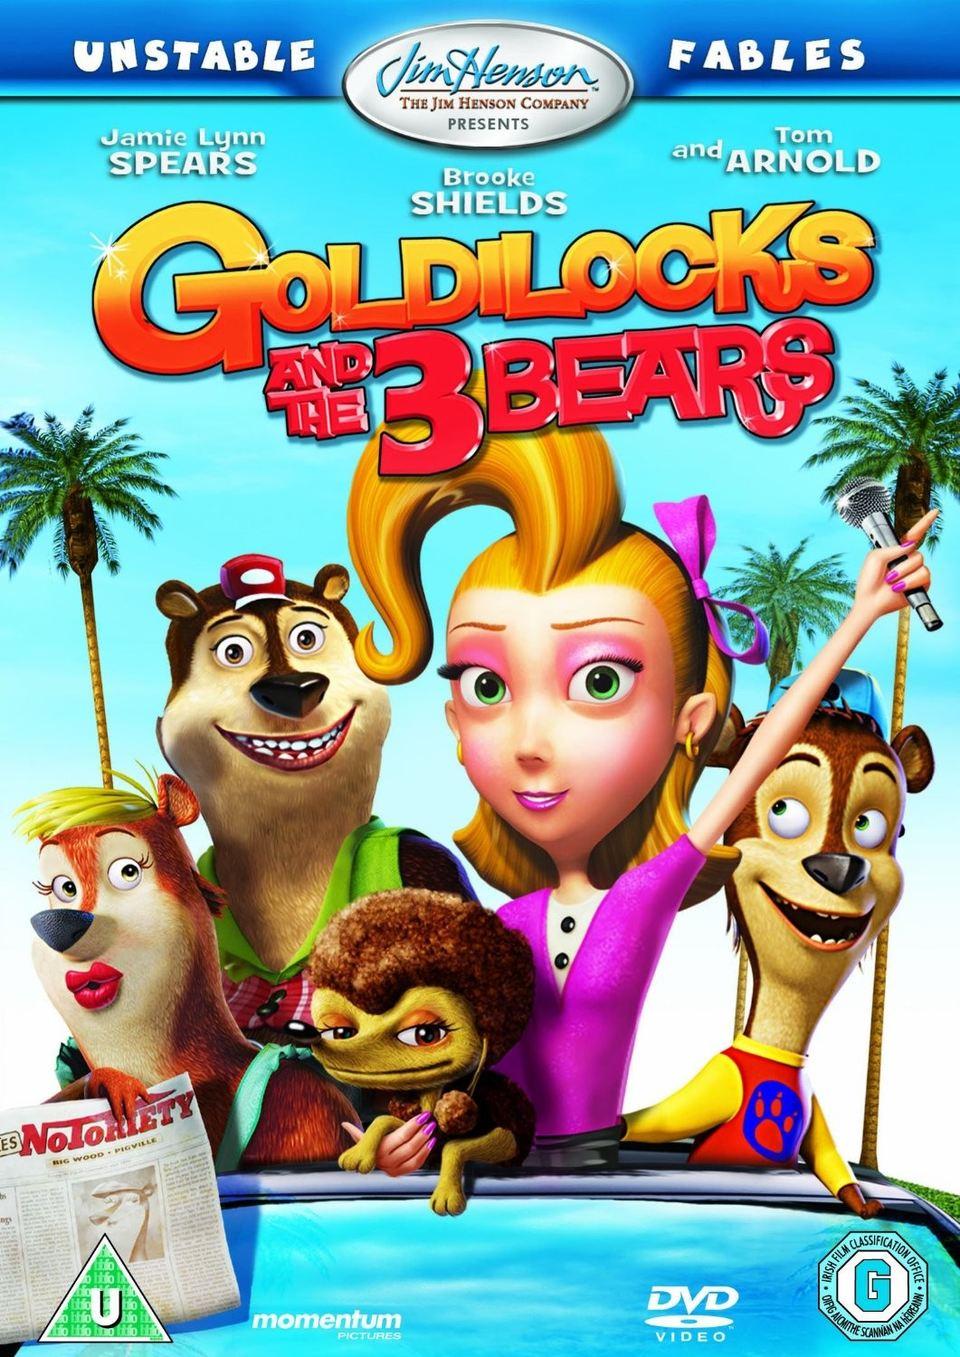 Film Zlatovláska a 3 medvědi